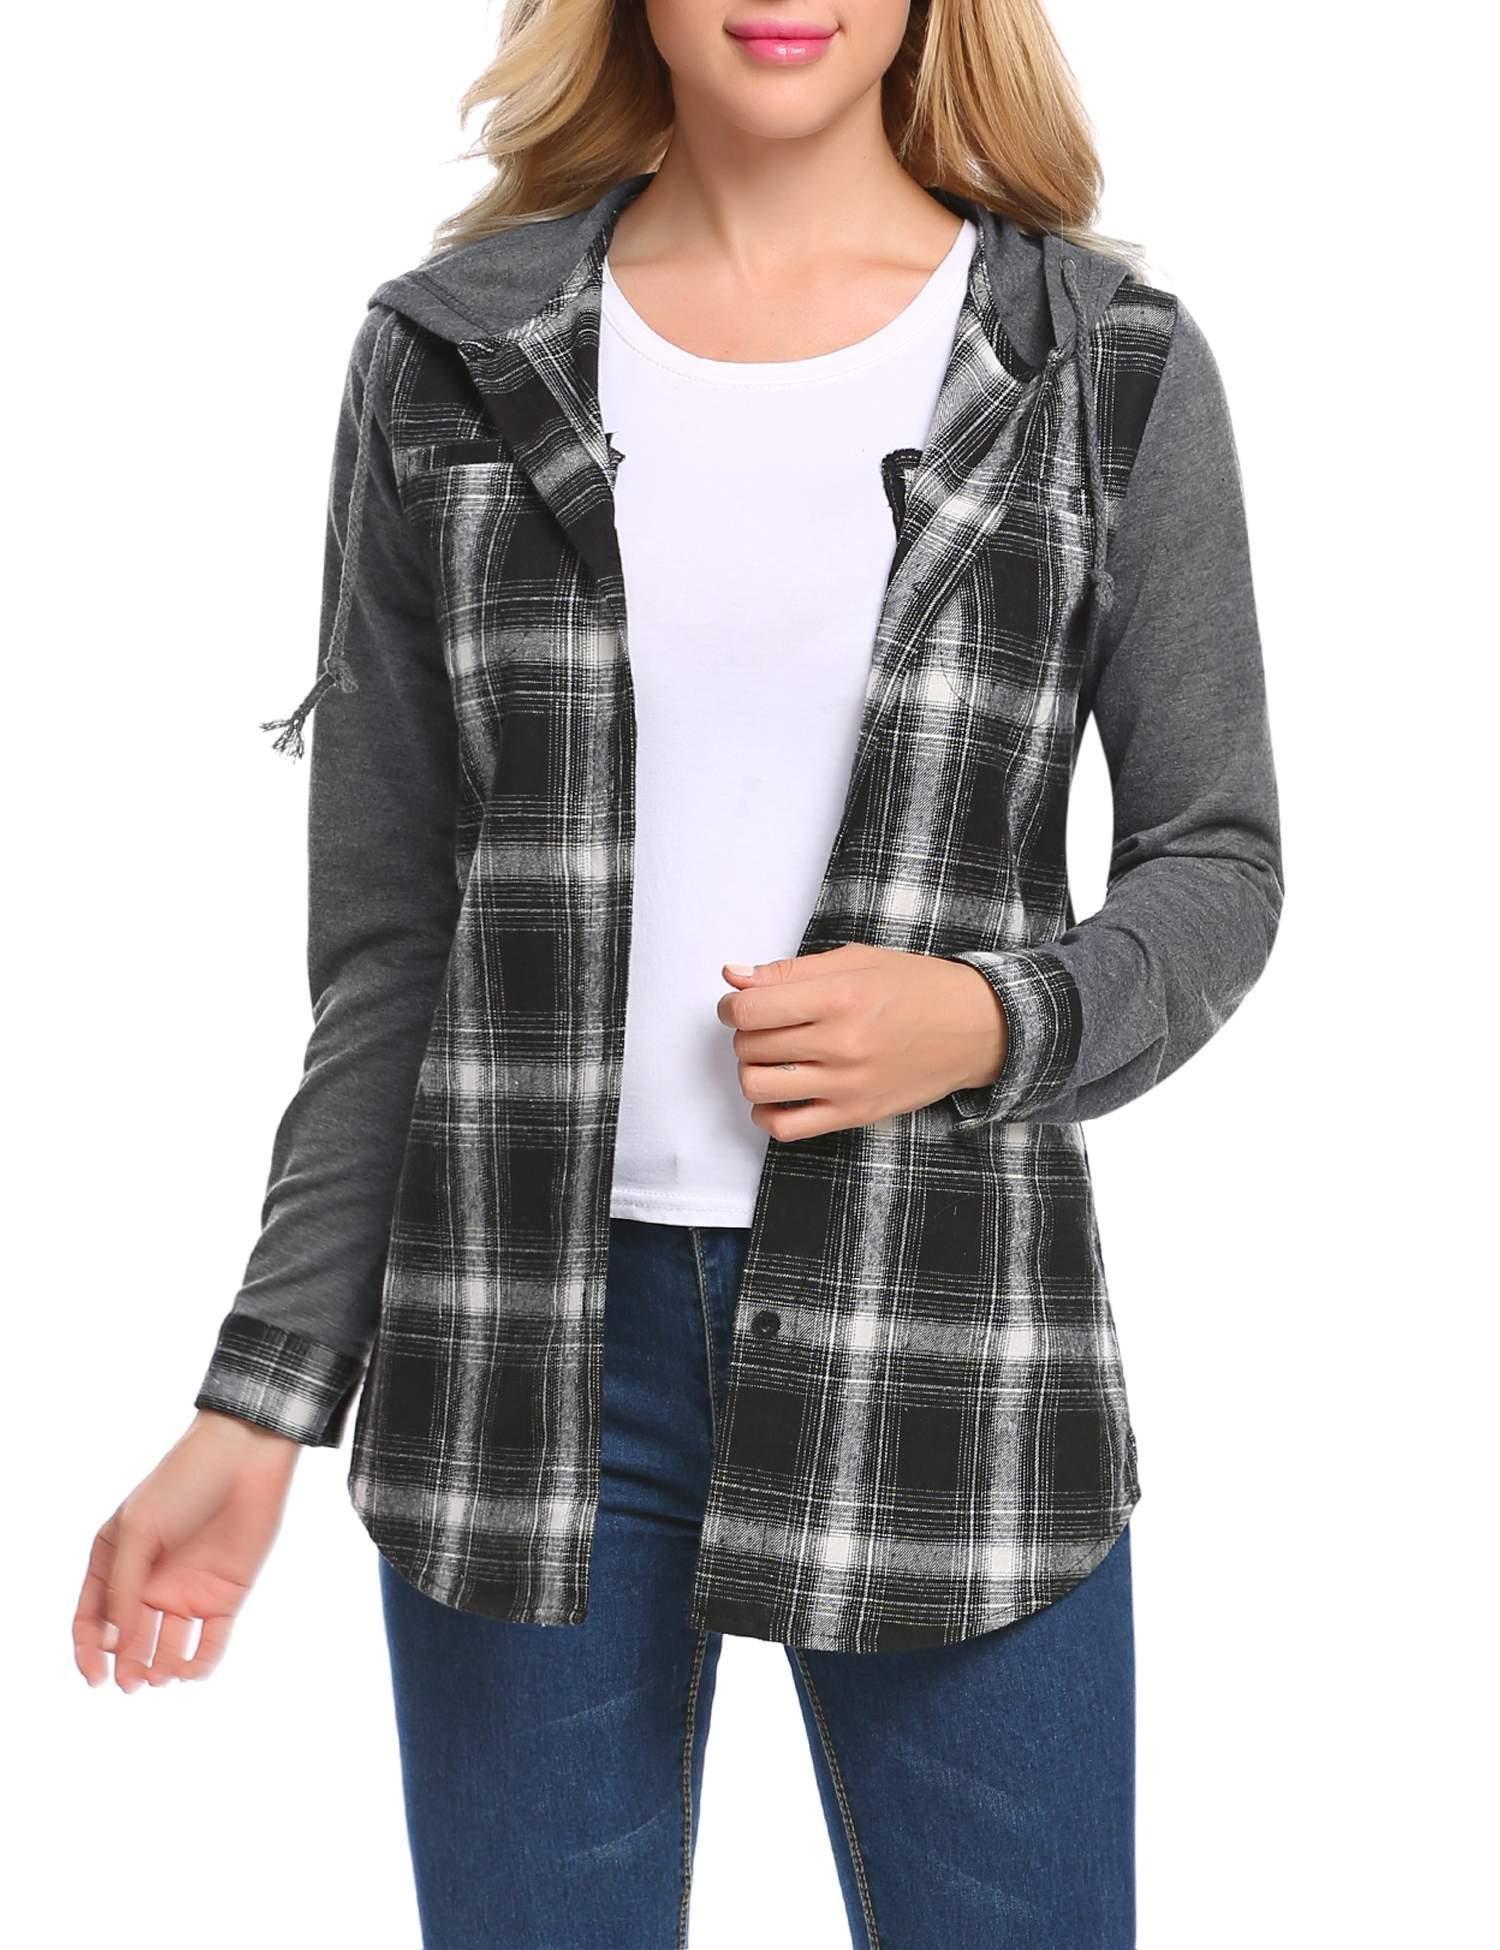 Billti Womens Casual Long Sleeve Plaid Button Hooded Shirt